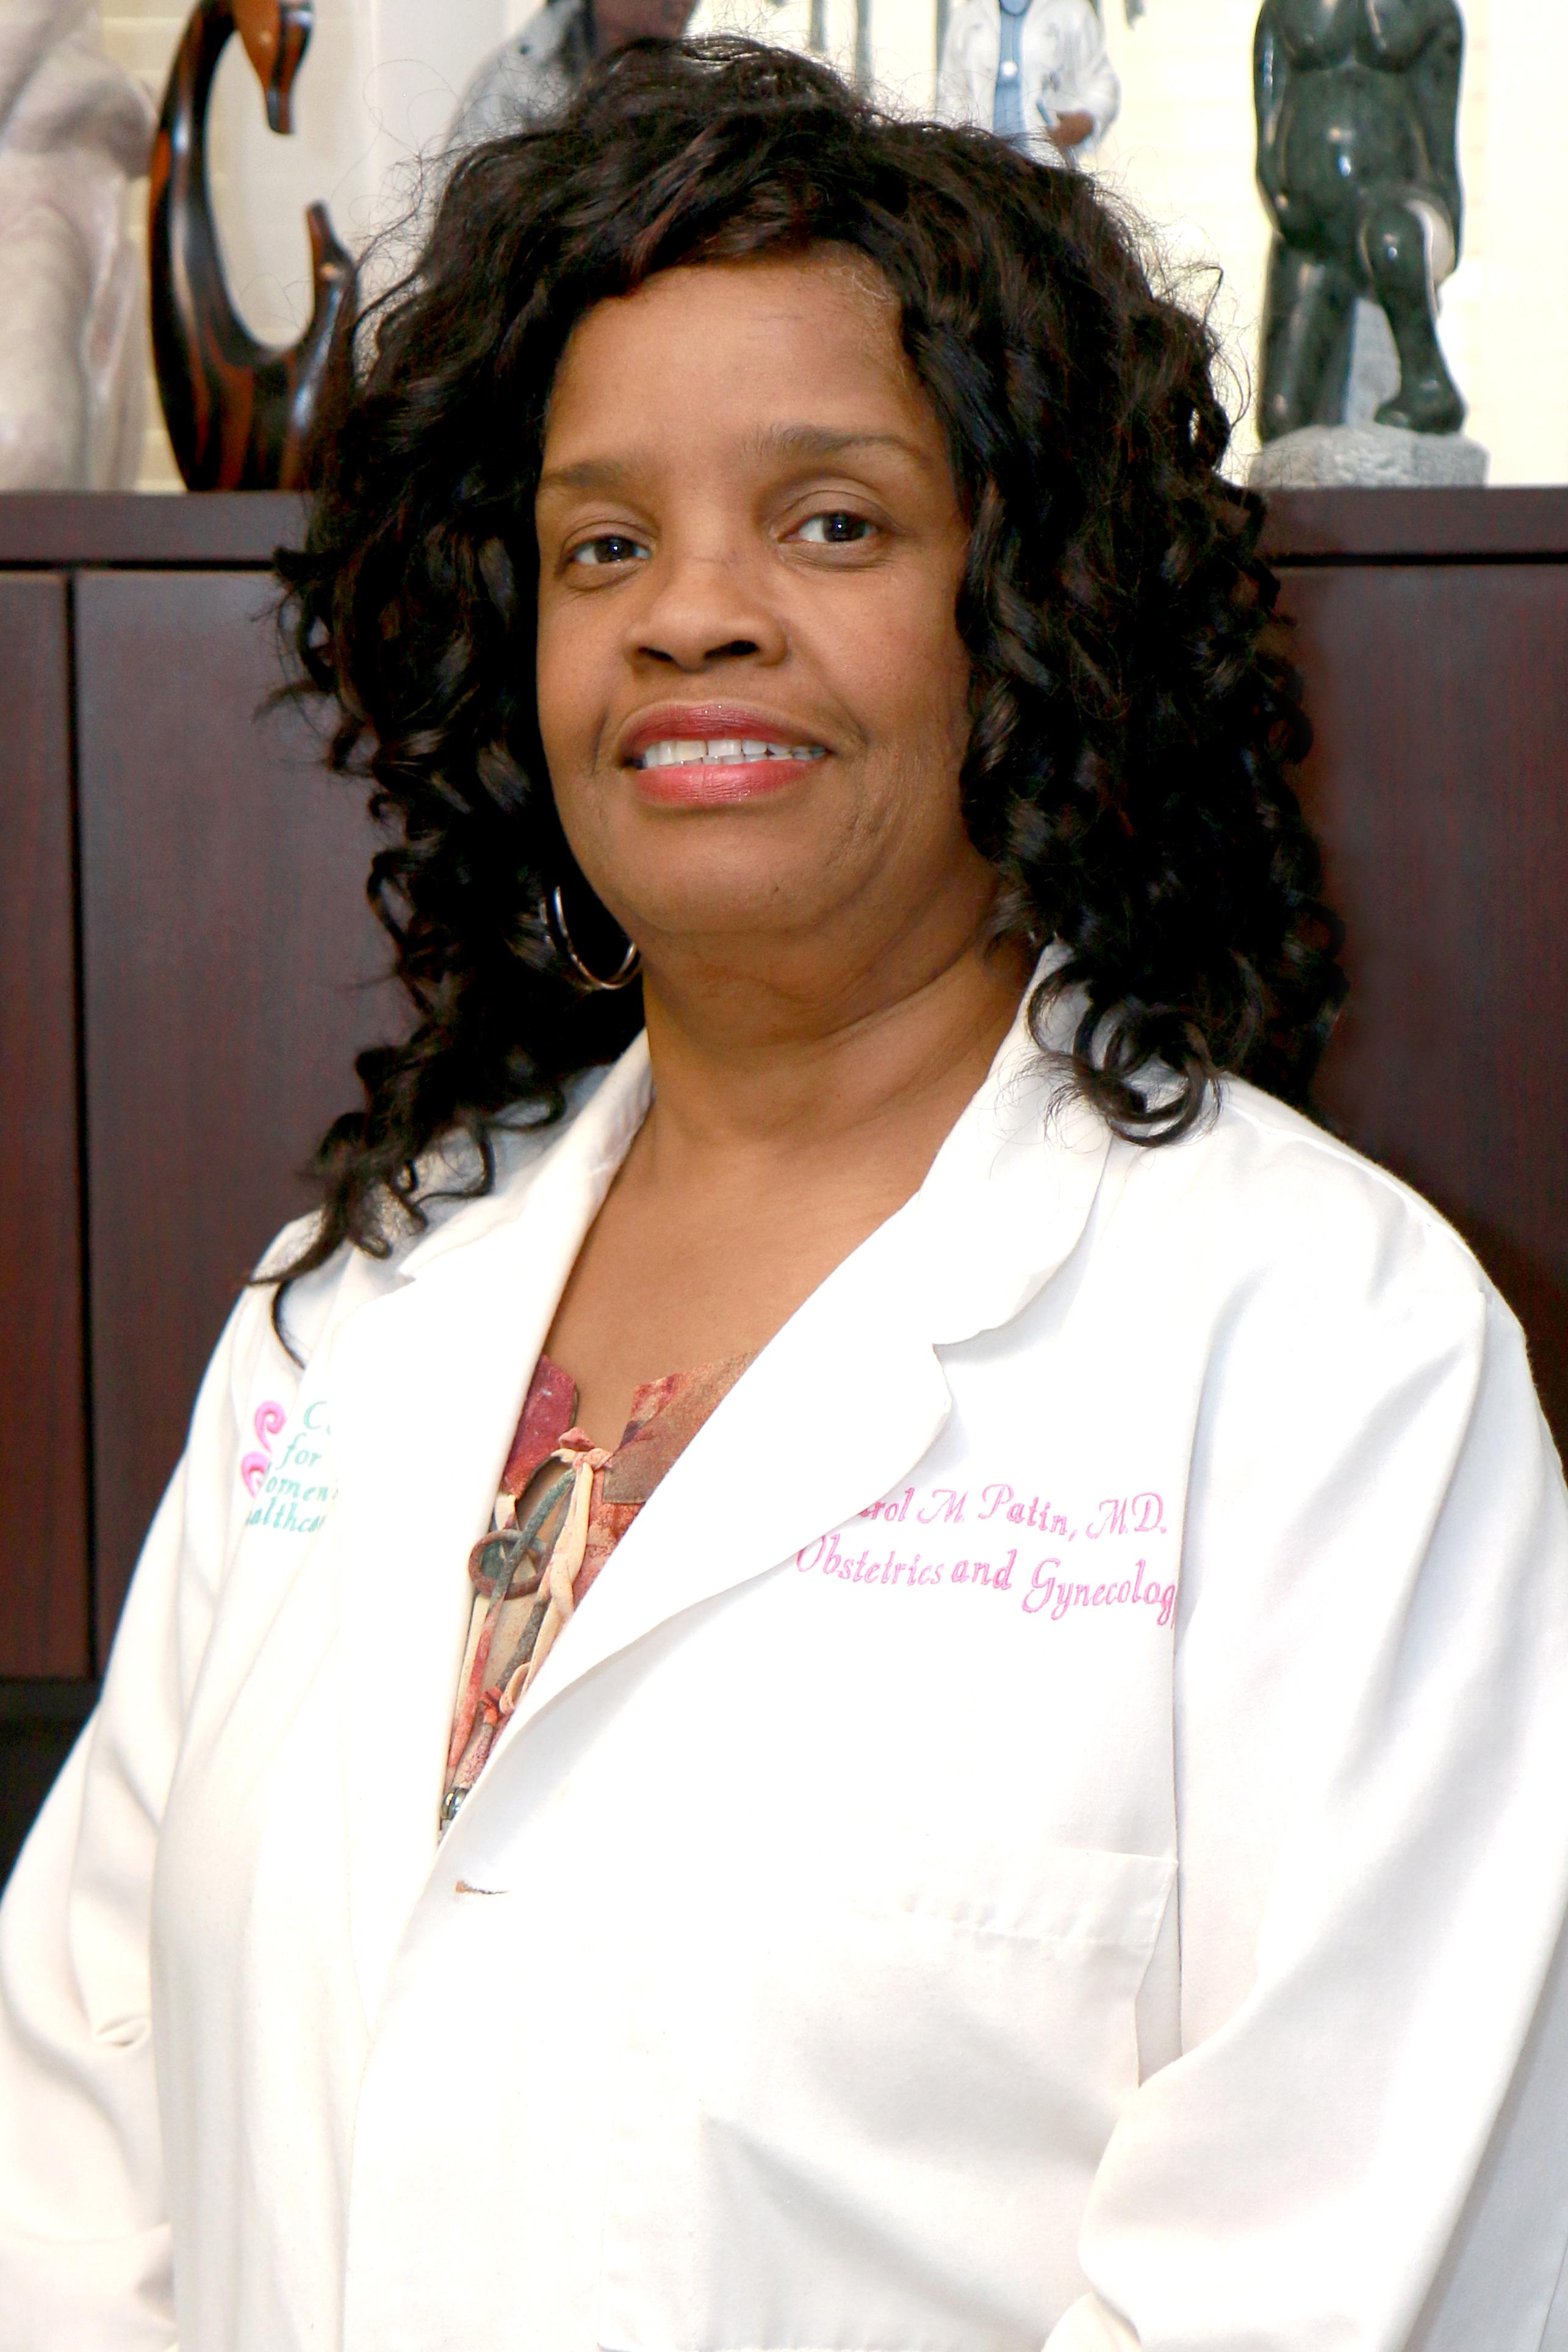 Dr. Carol Patin, MD